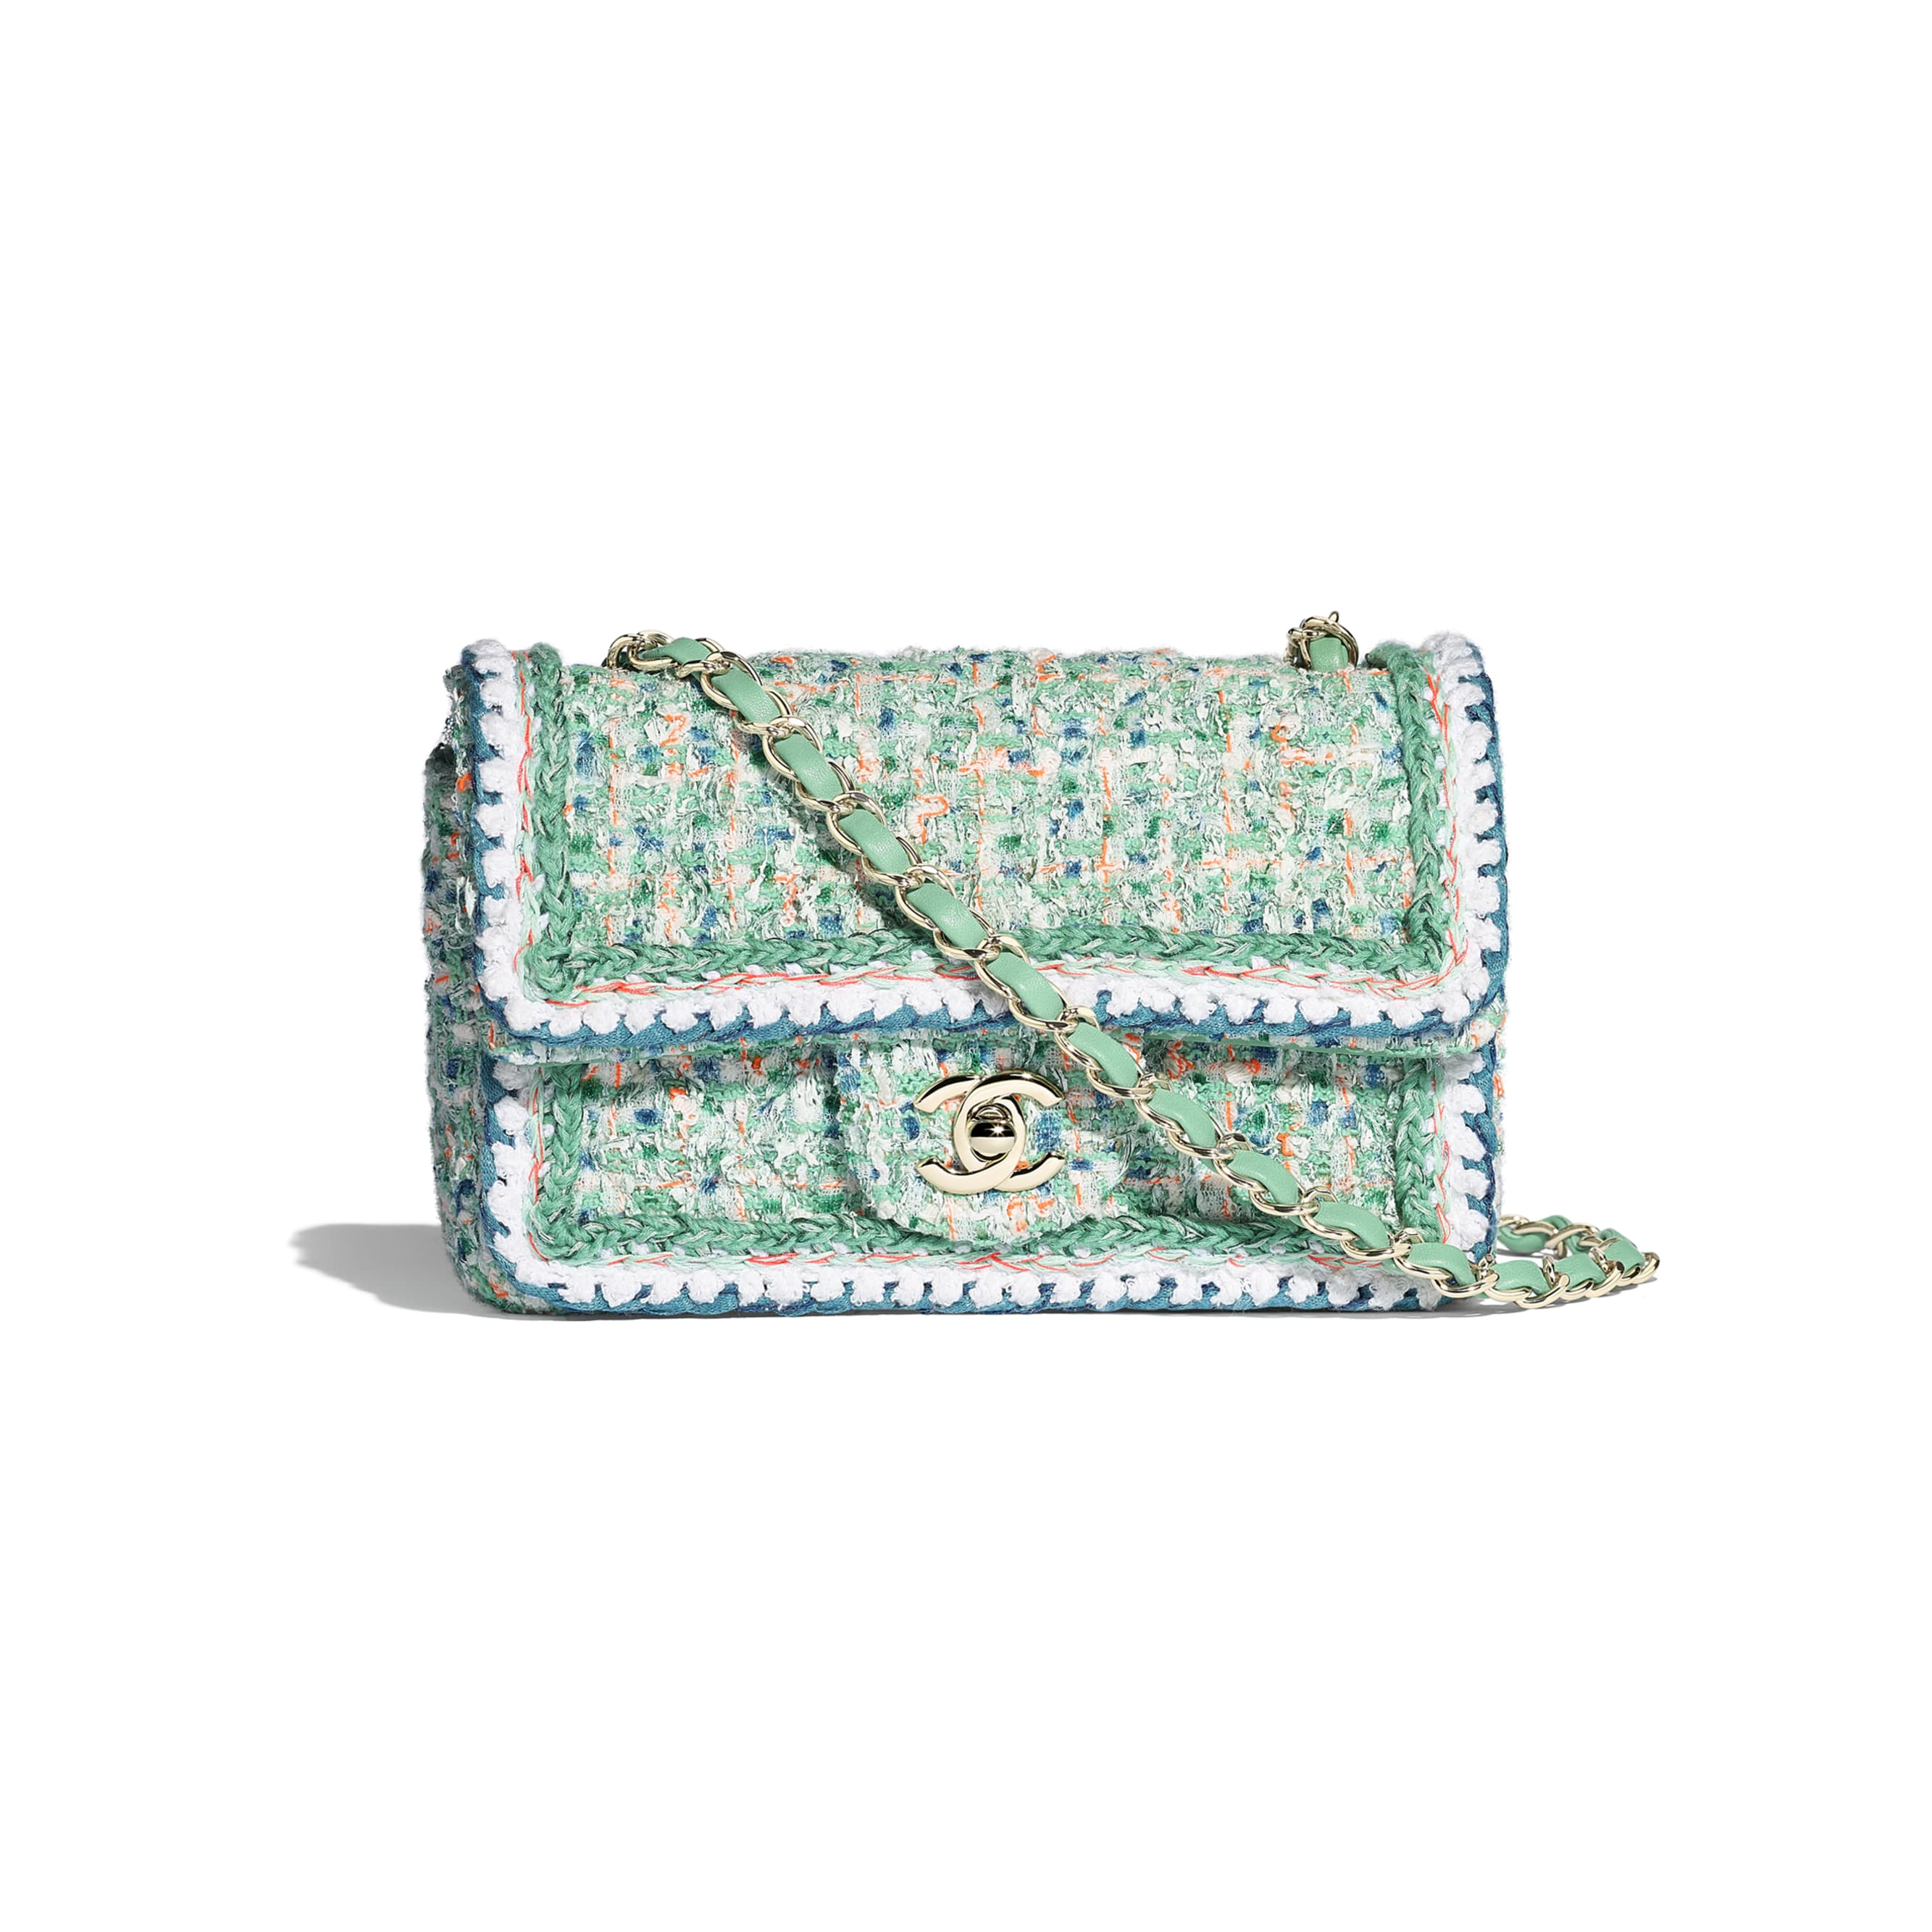 Mini Flap Bag - Green, White, Blue & Orange - Tweed & Gold-Tone Metal - Default view - see standard sized version